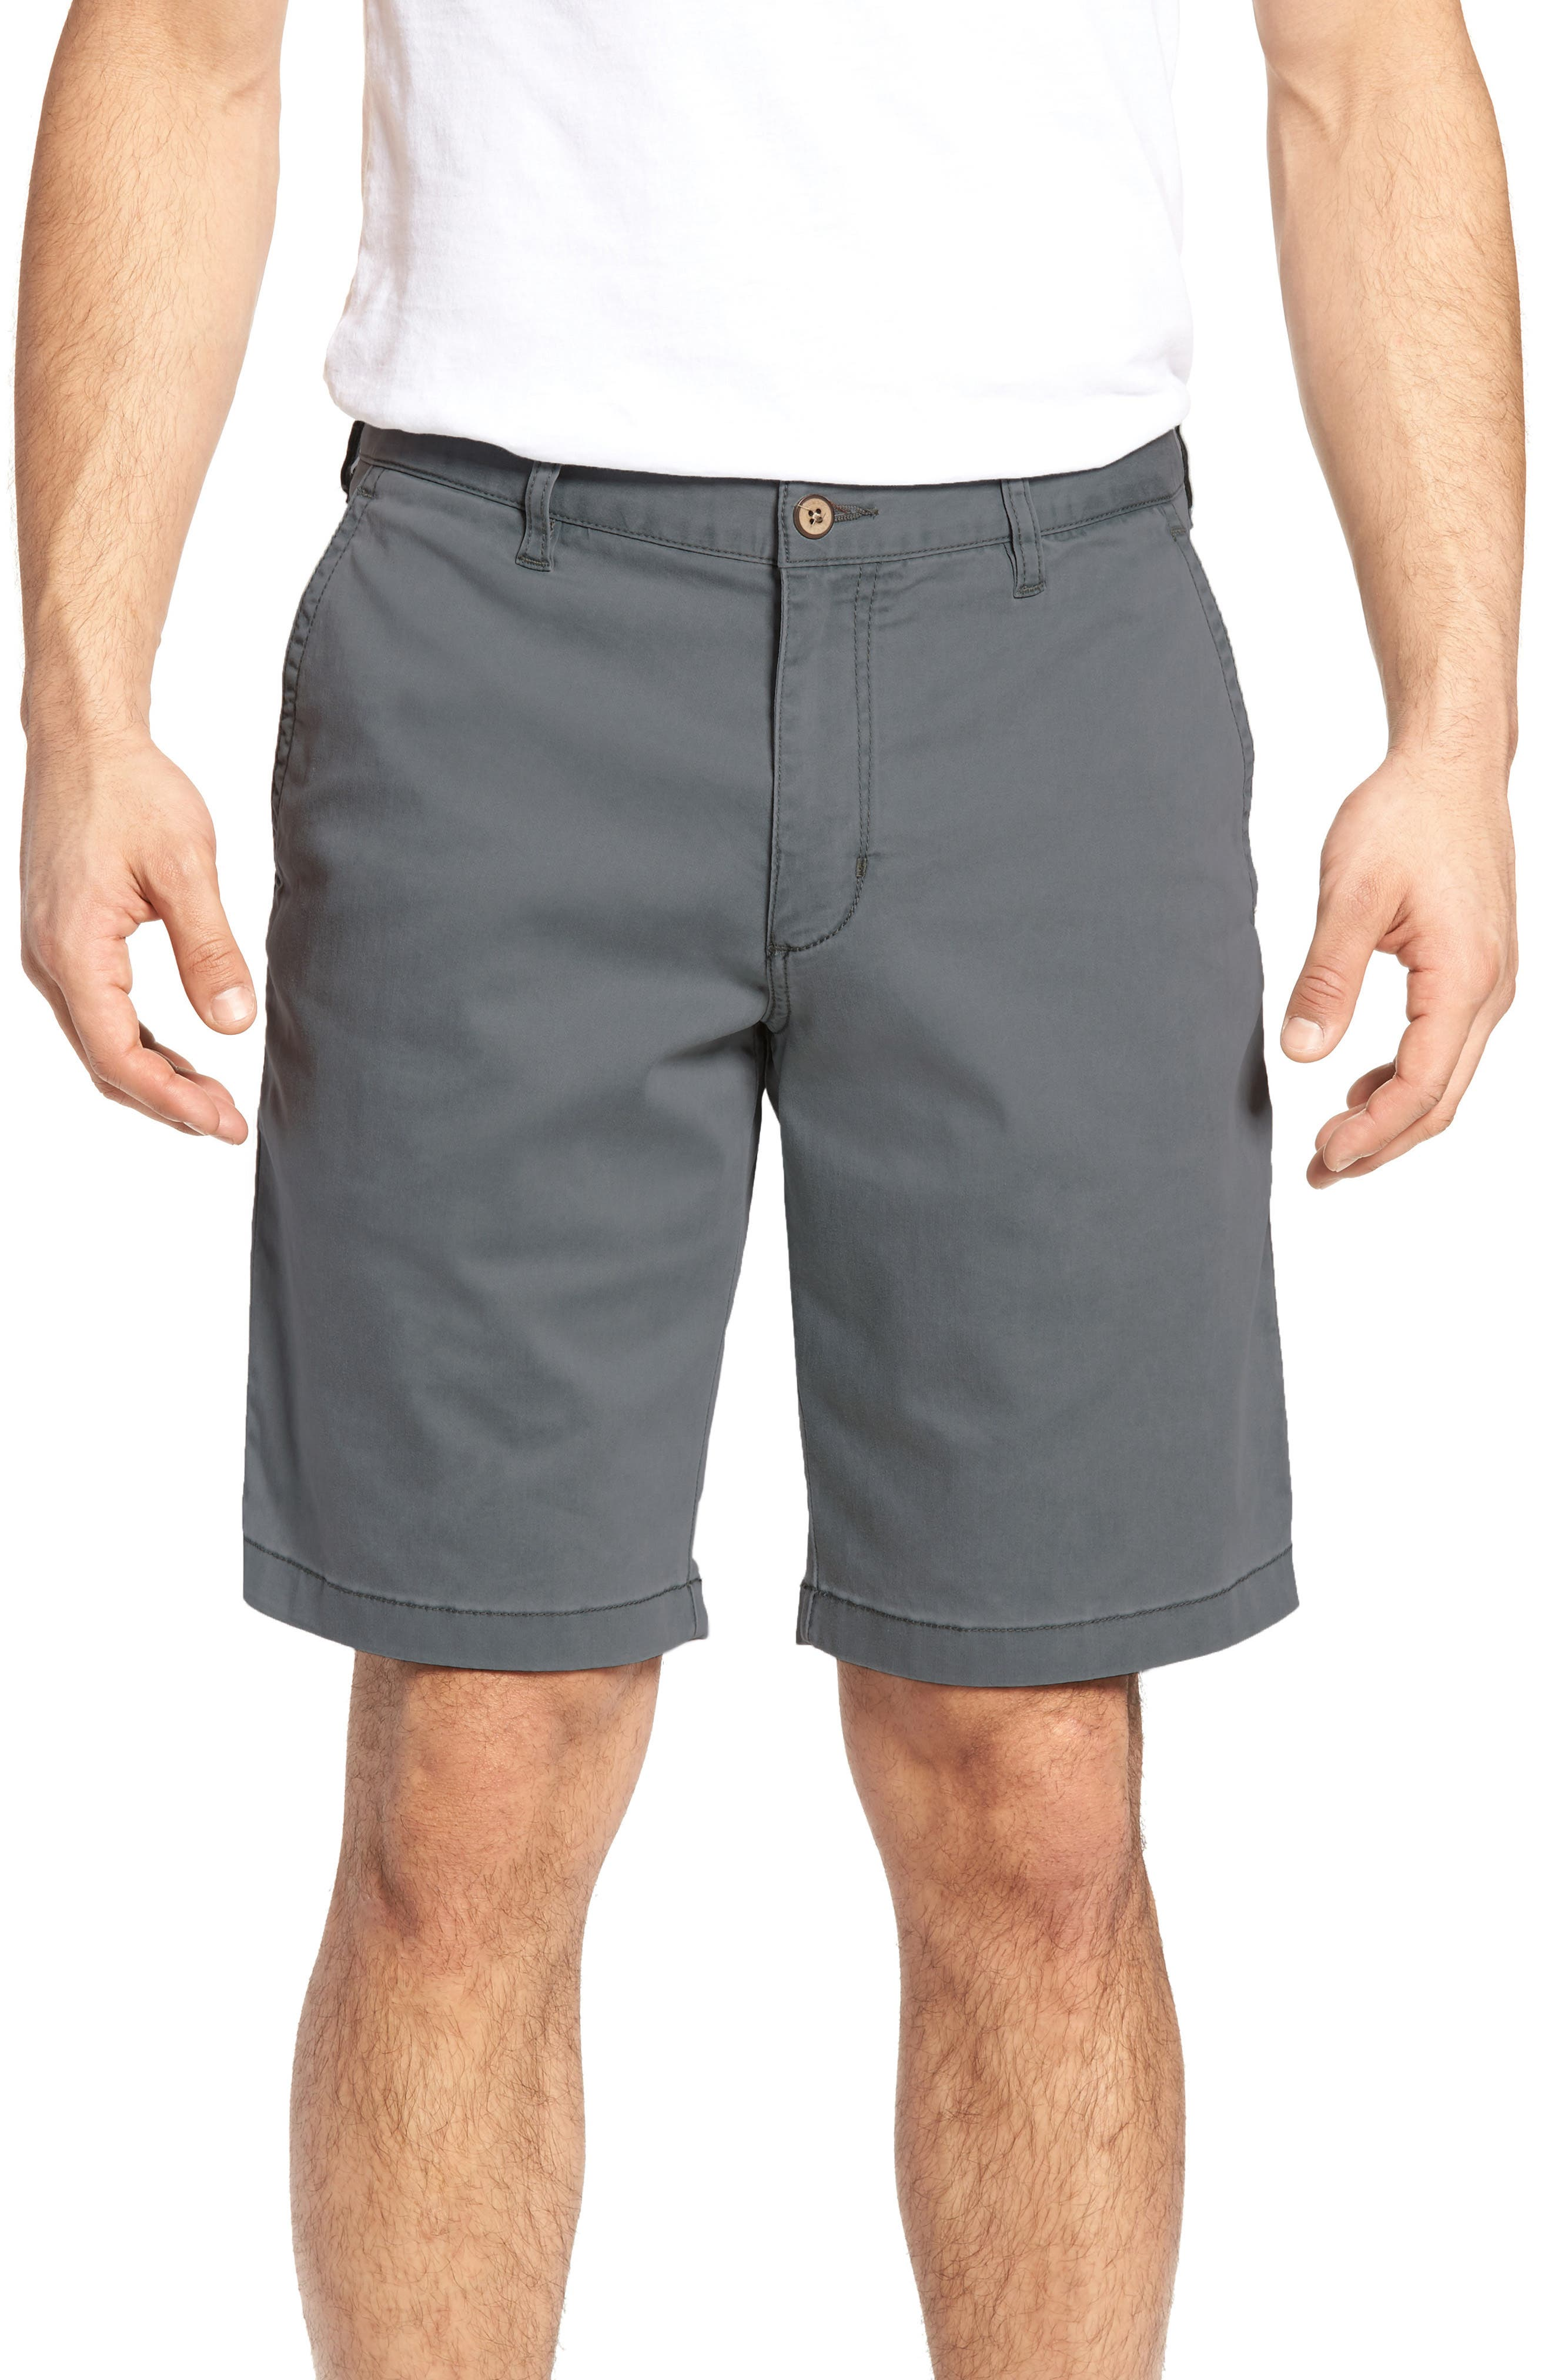 Alternate Image 1 Selected - Tommy Bahama Boracay Chino Shorts